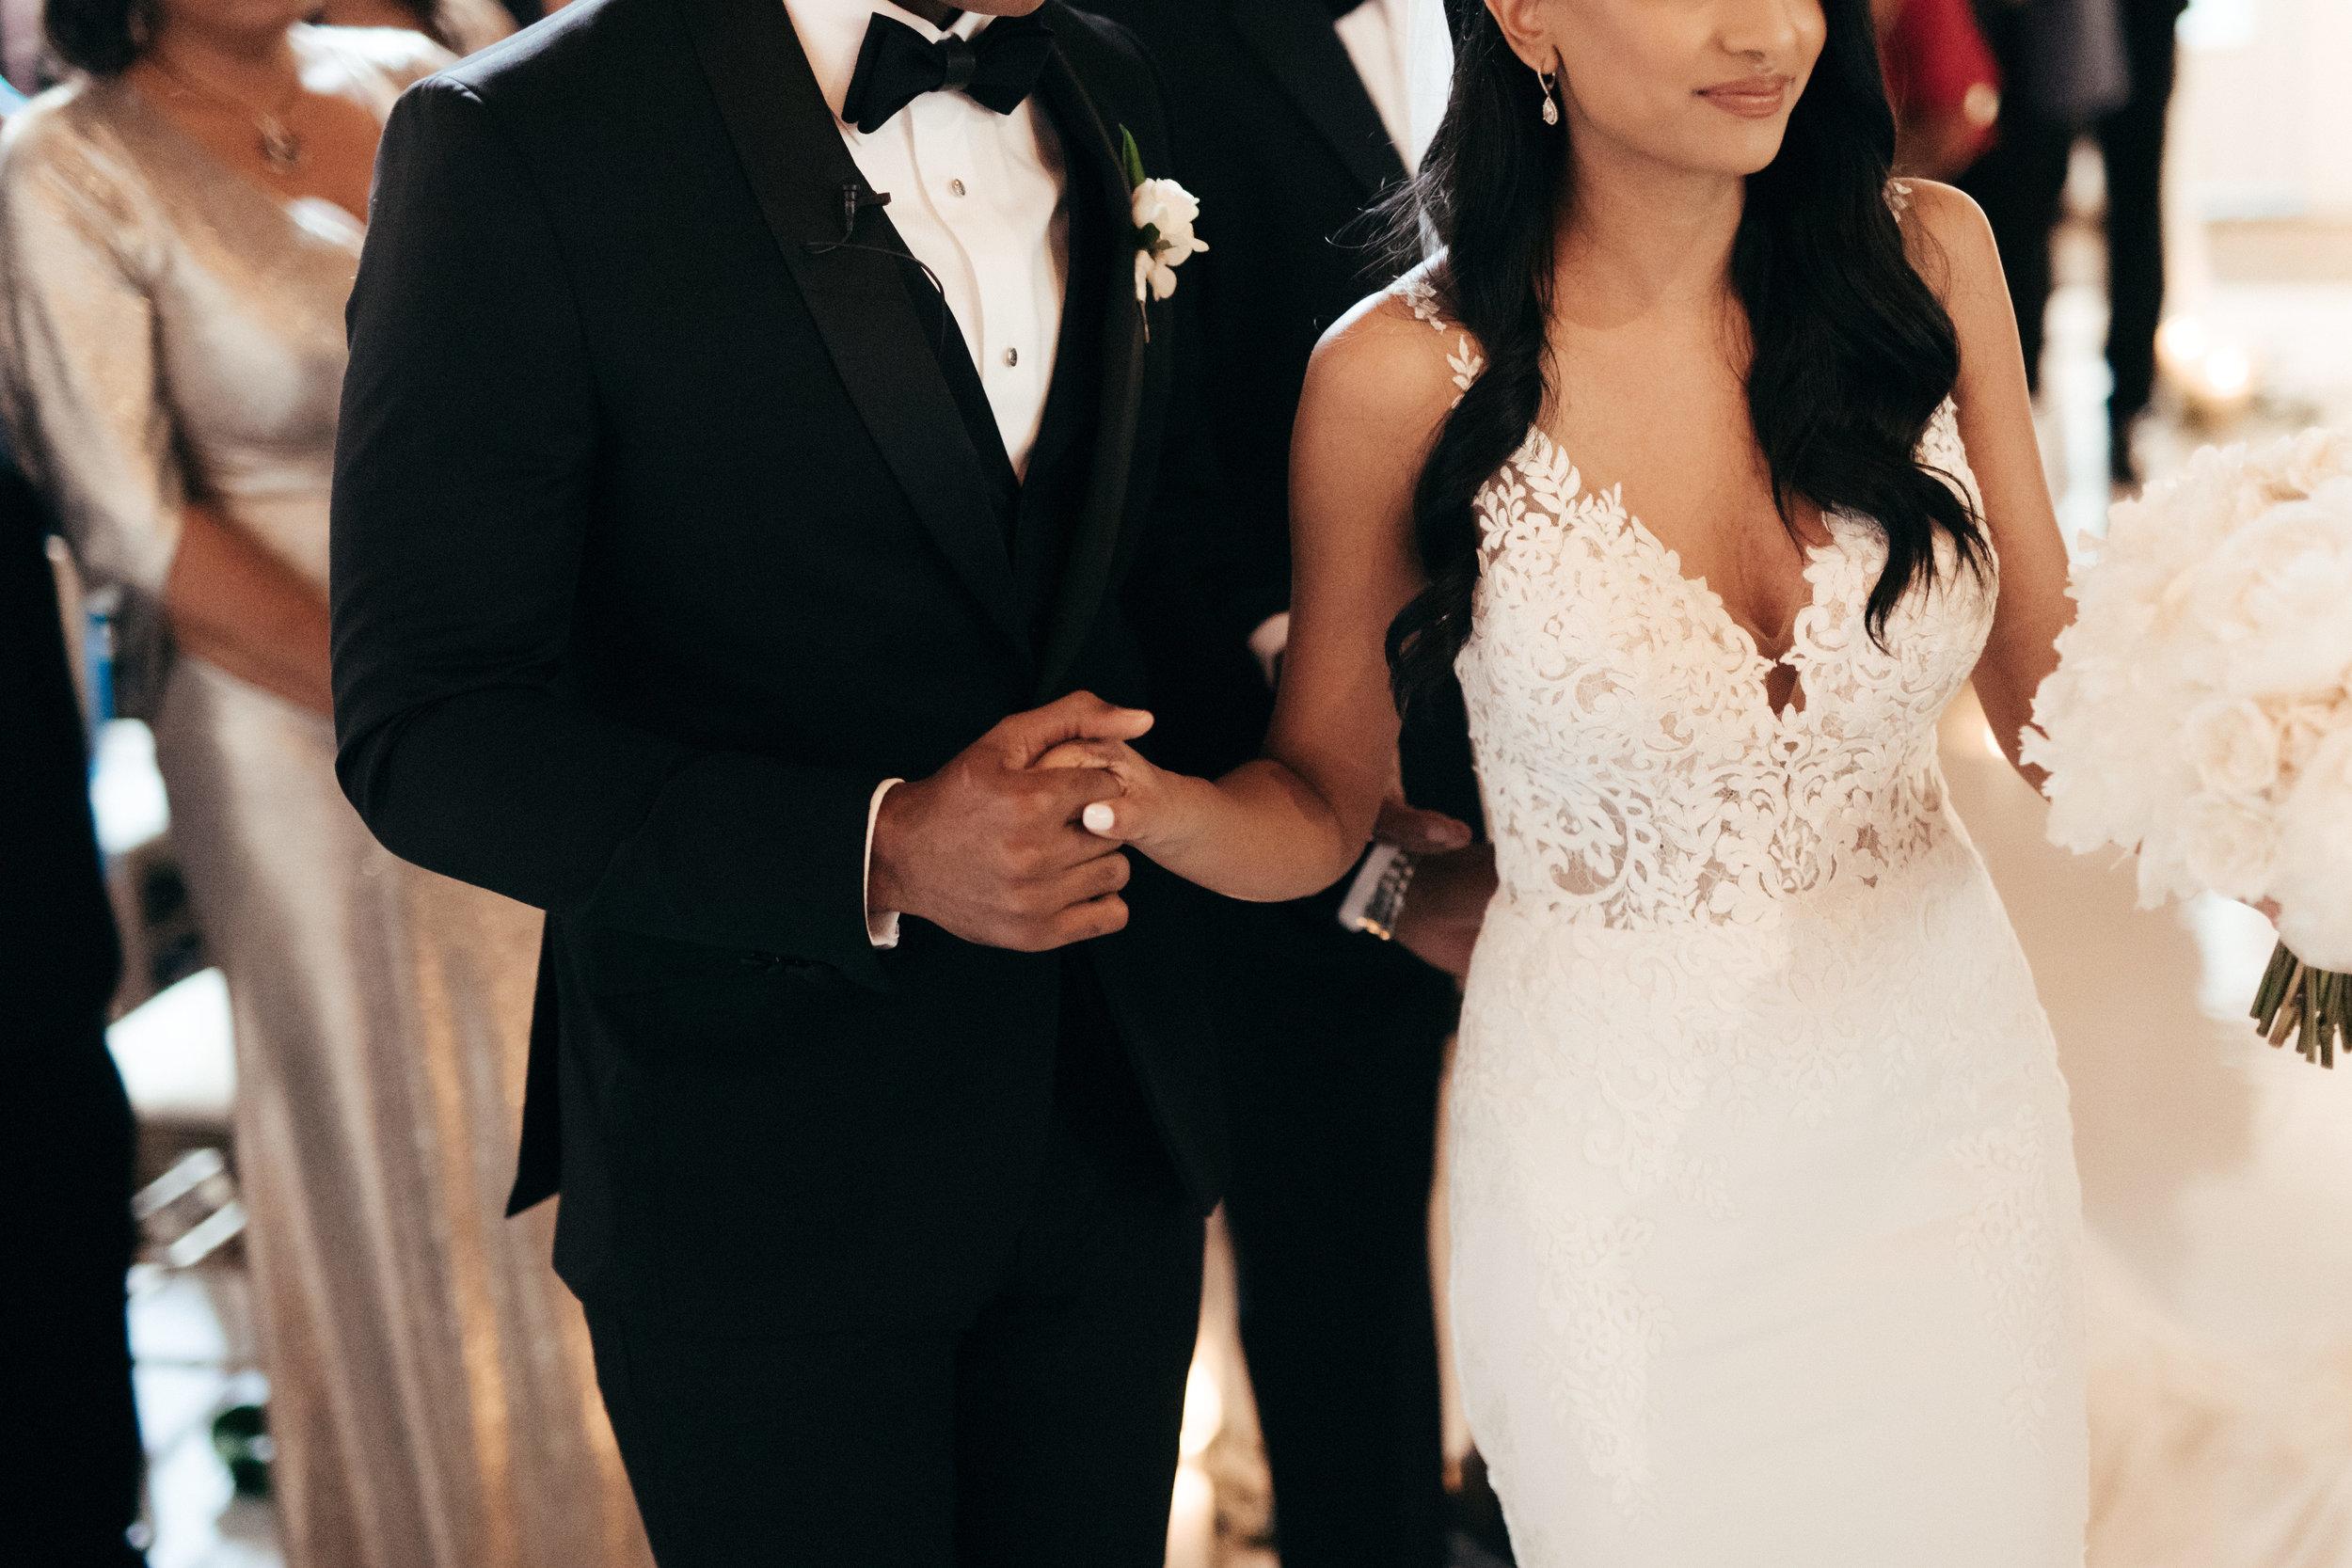 Mindy&Jared-wedding-by-LadiesAndGentlemen-by-Matija-Vuri-3385.jpg